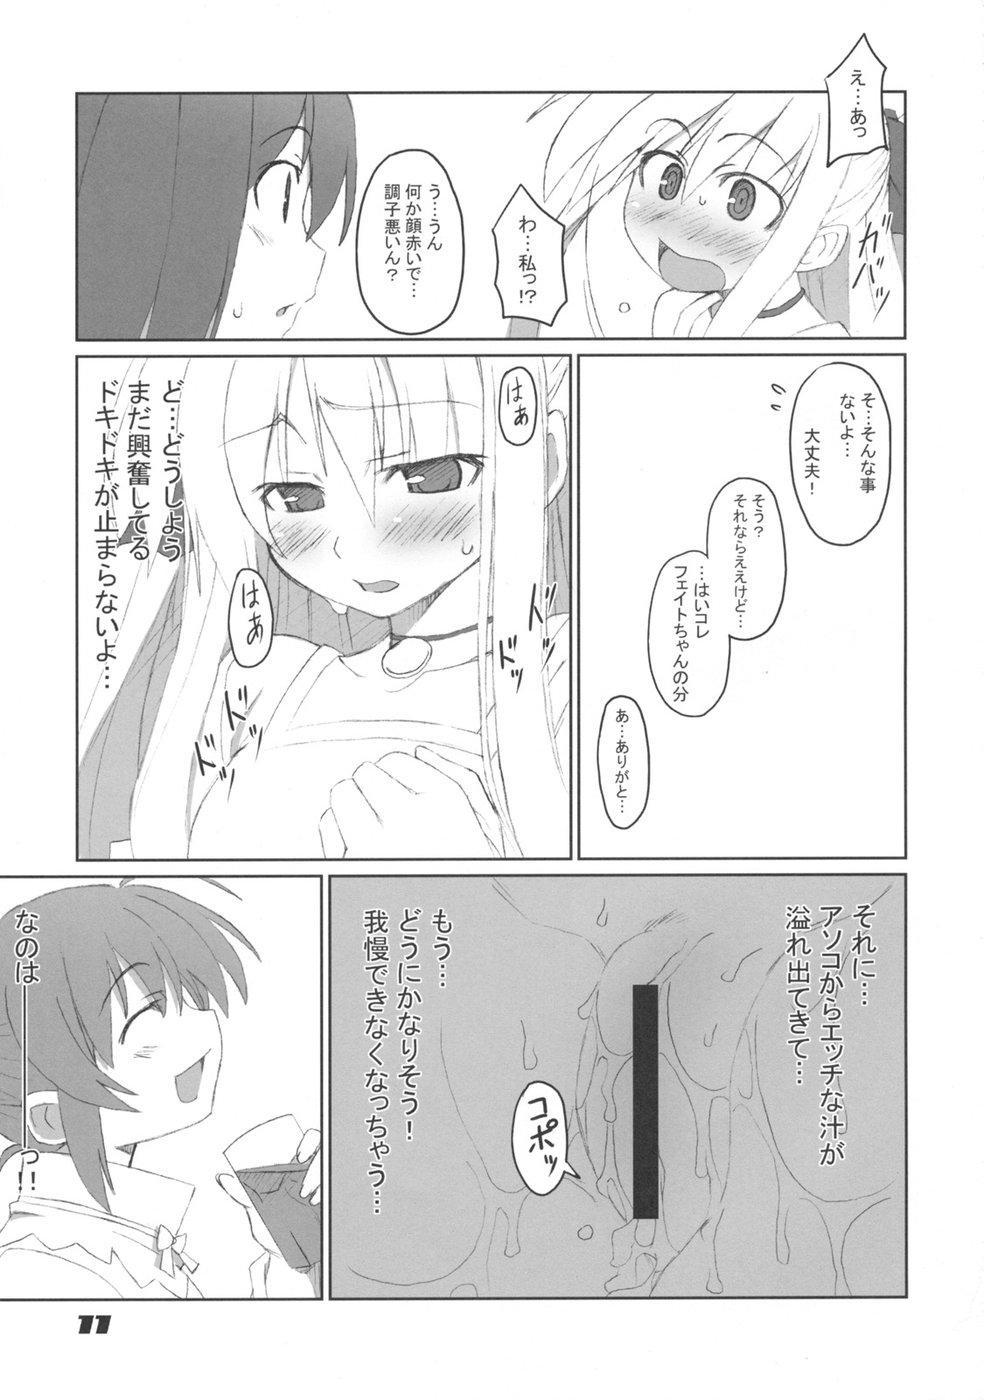 Fate-chan Igai to Moroi no A's 10